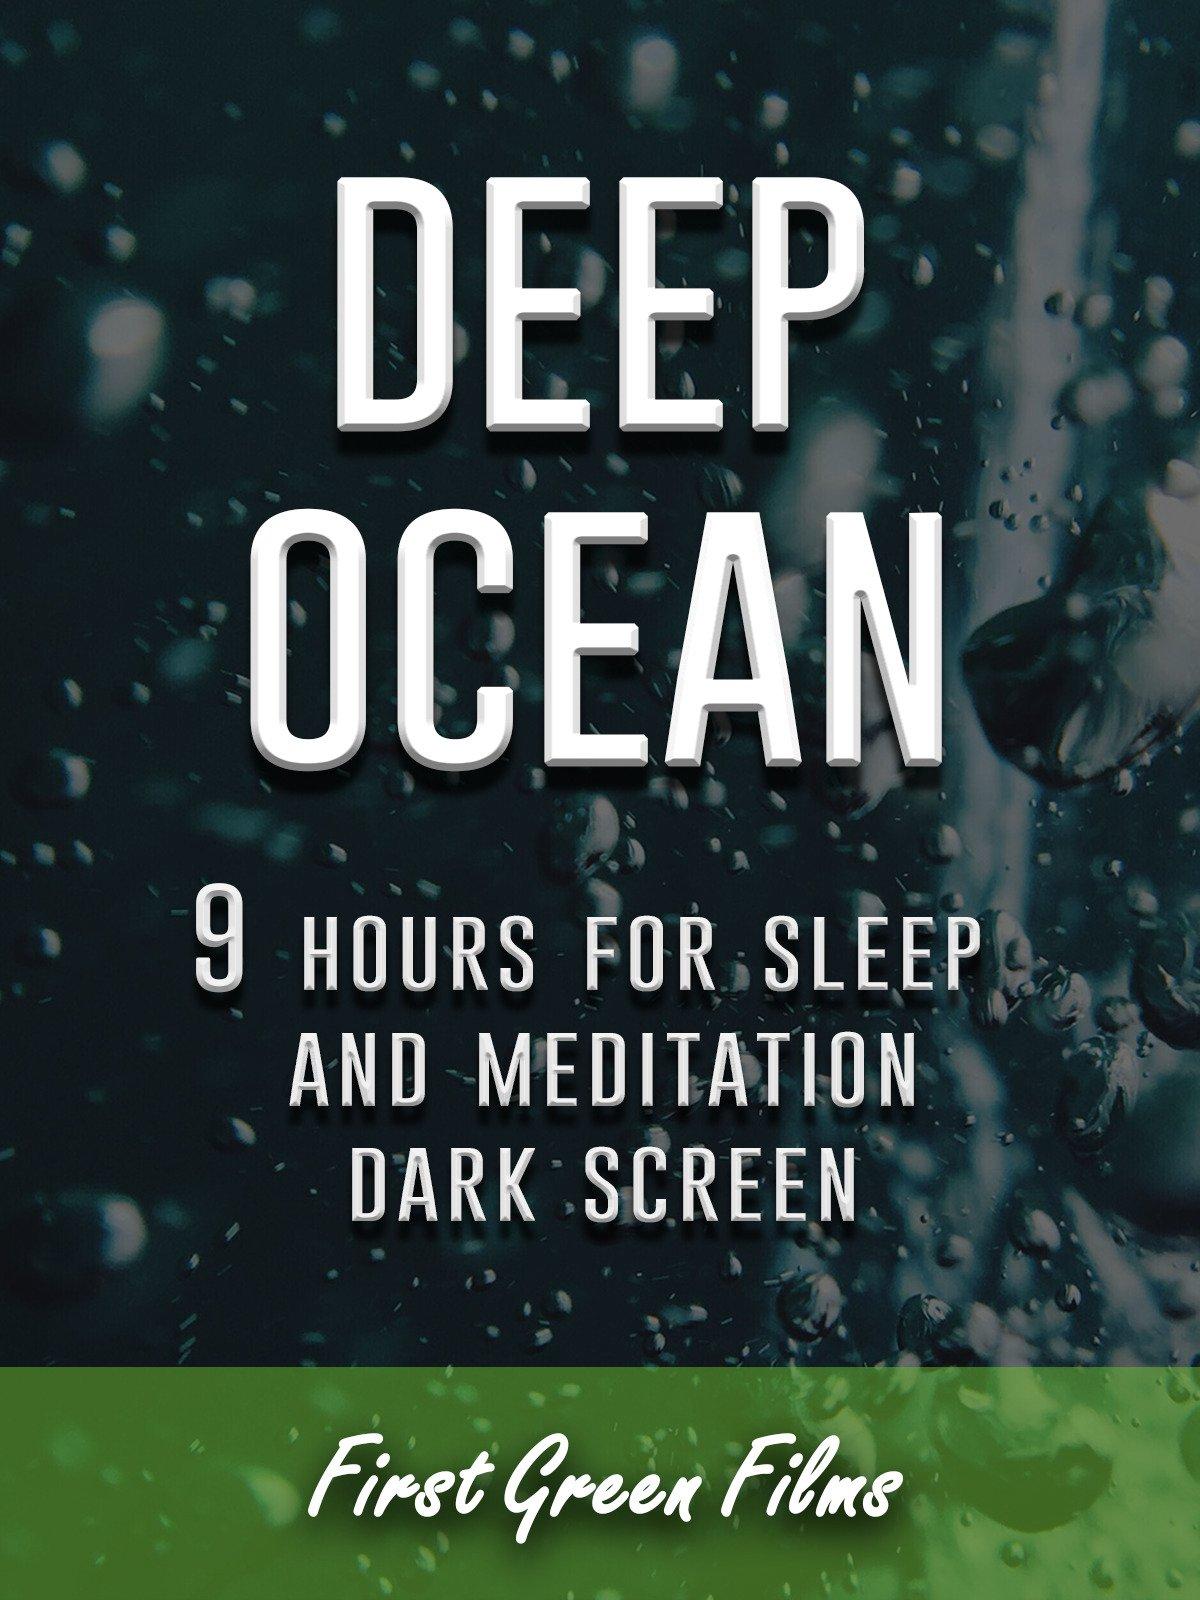 Deep ocean, 9 hours for Sleep and Meditation, dark screen